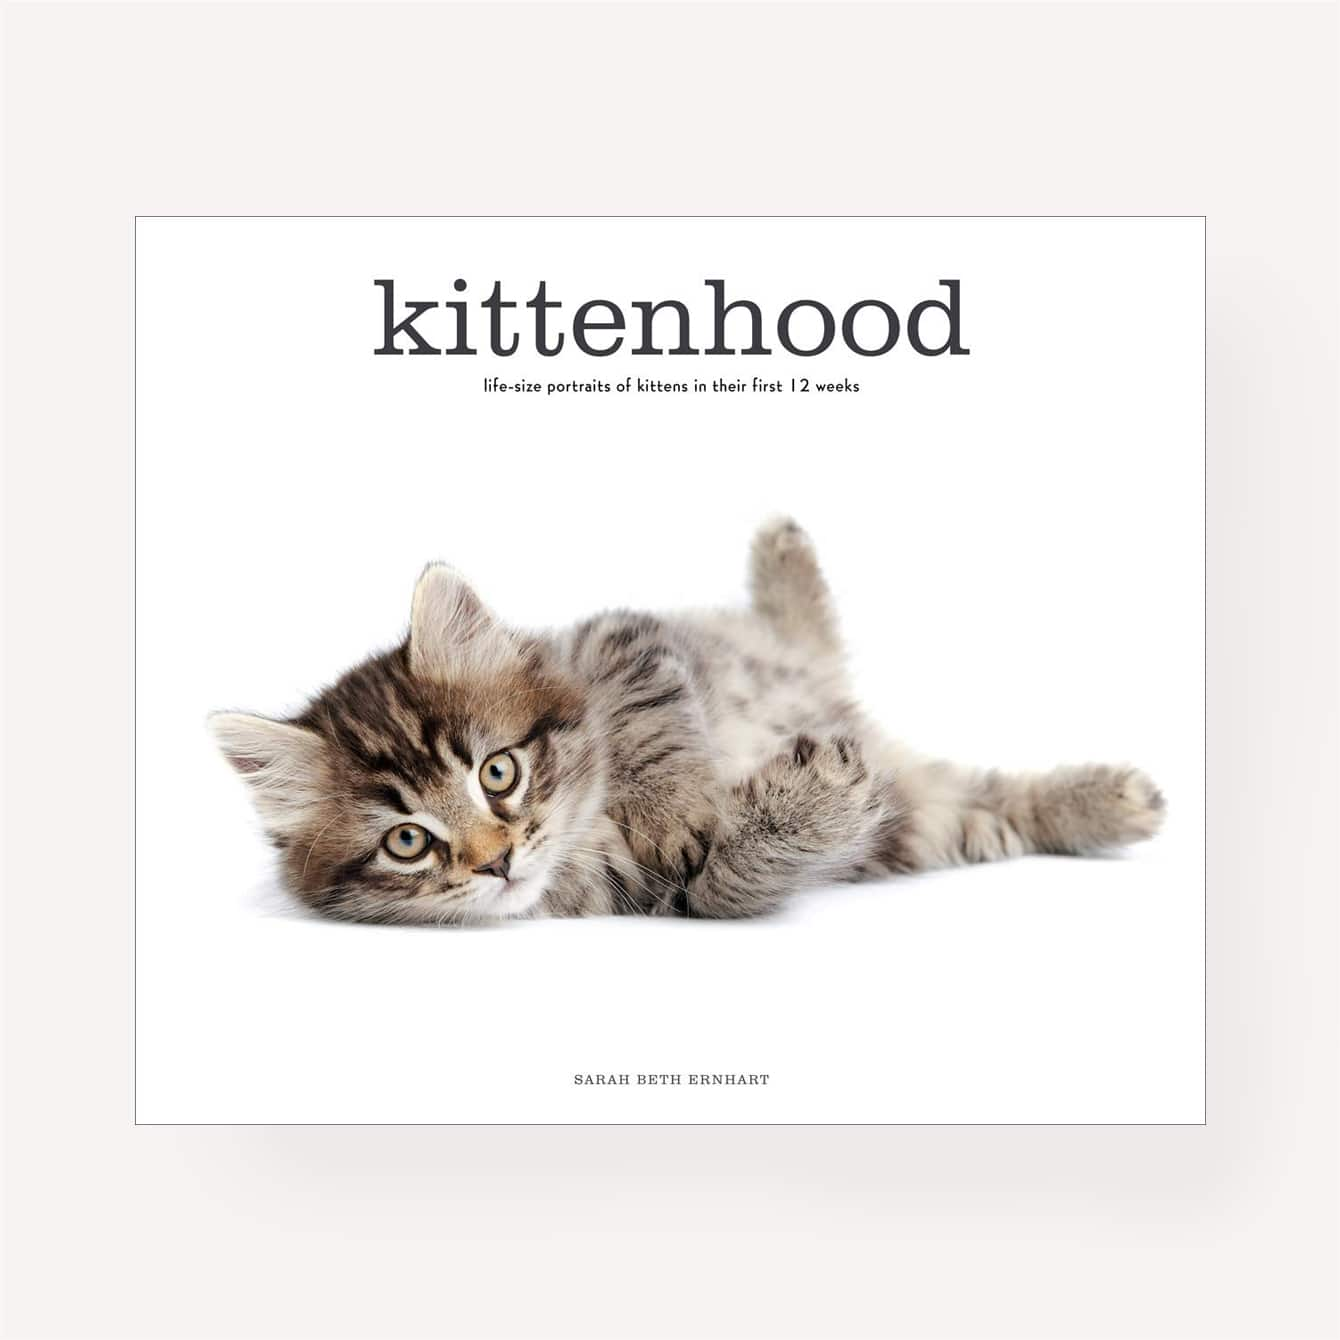 Kittenhood: Life-Size Portraits of Kittens